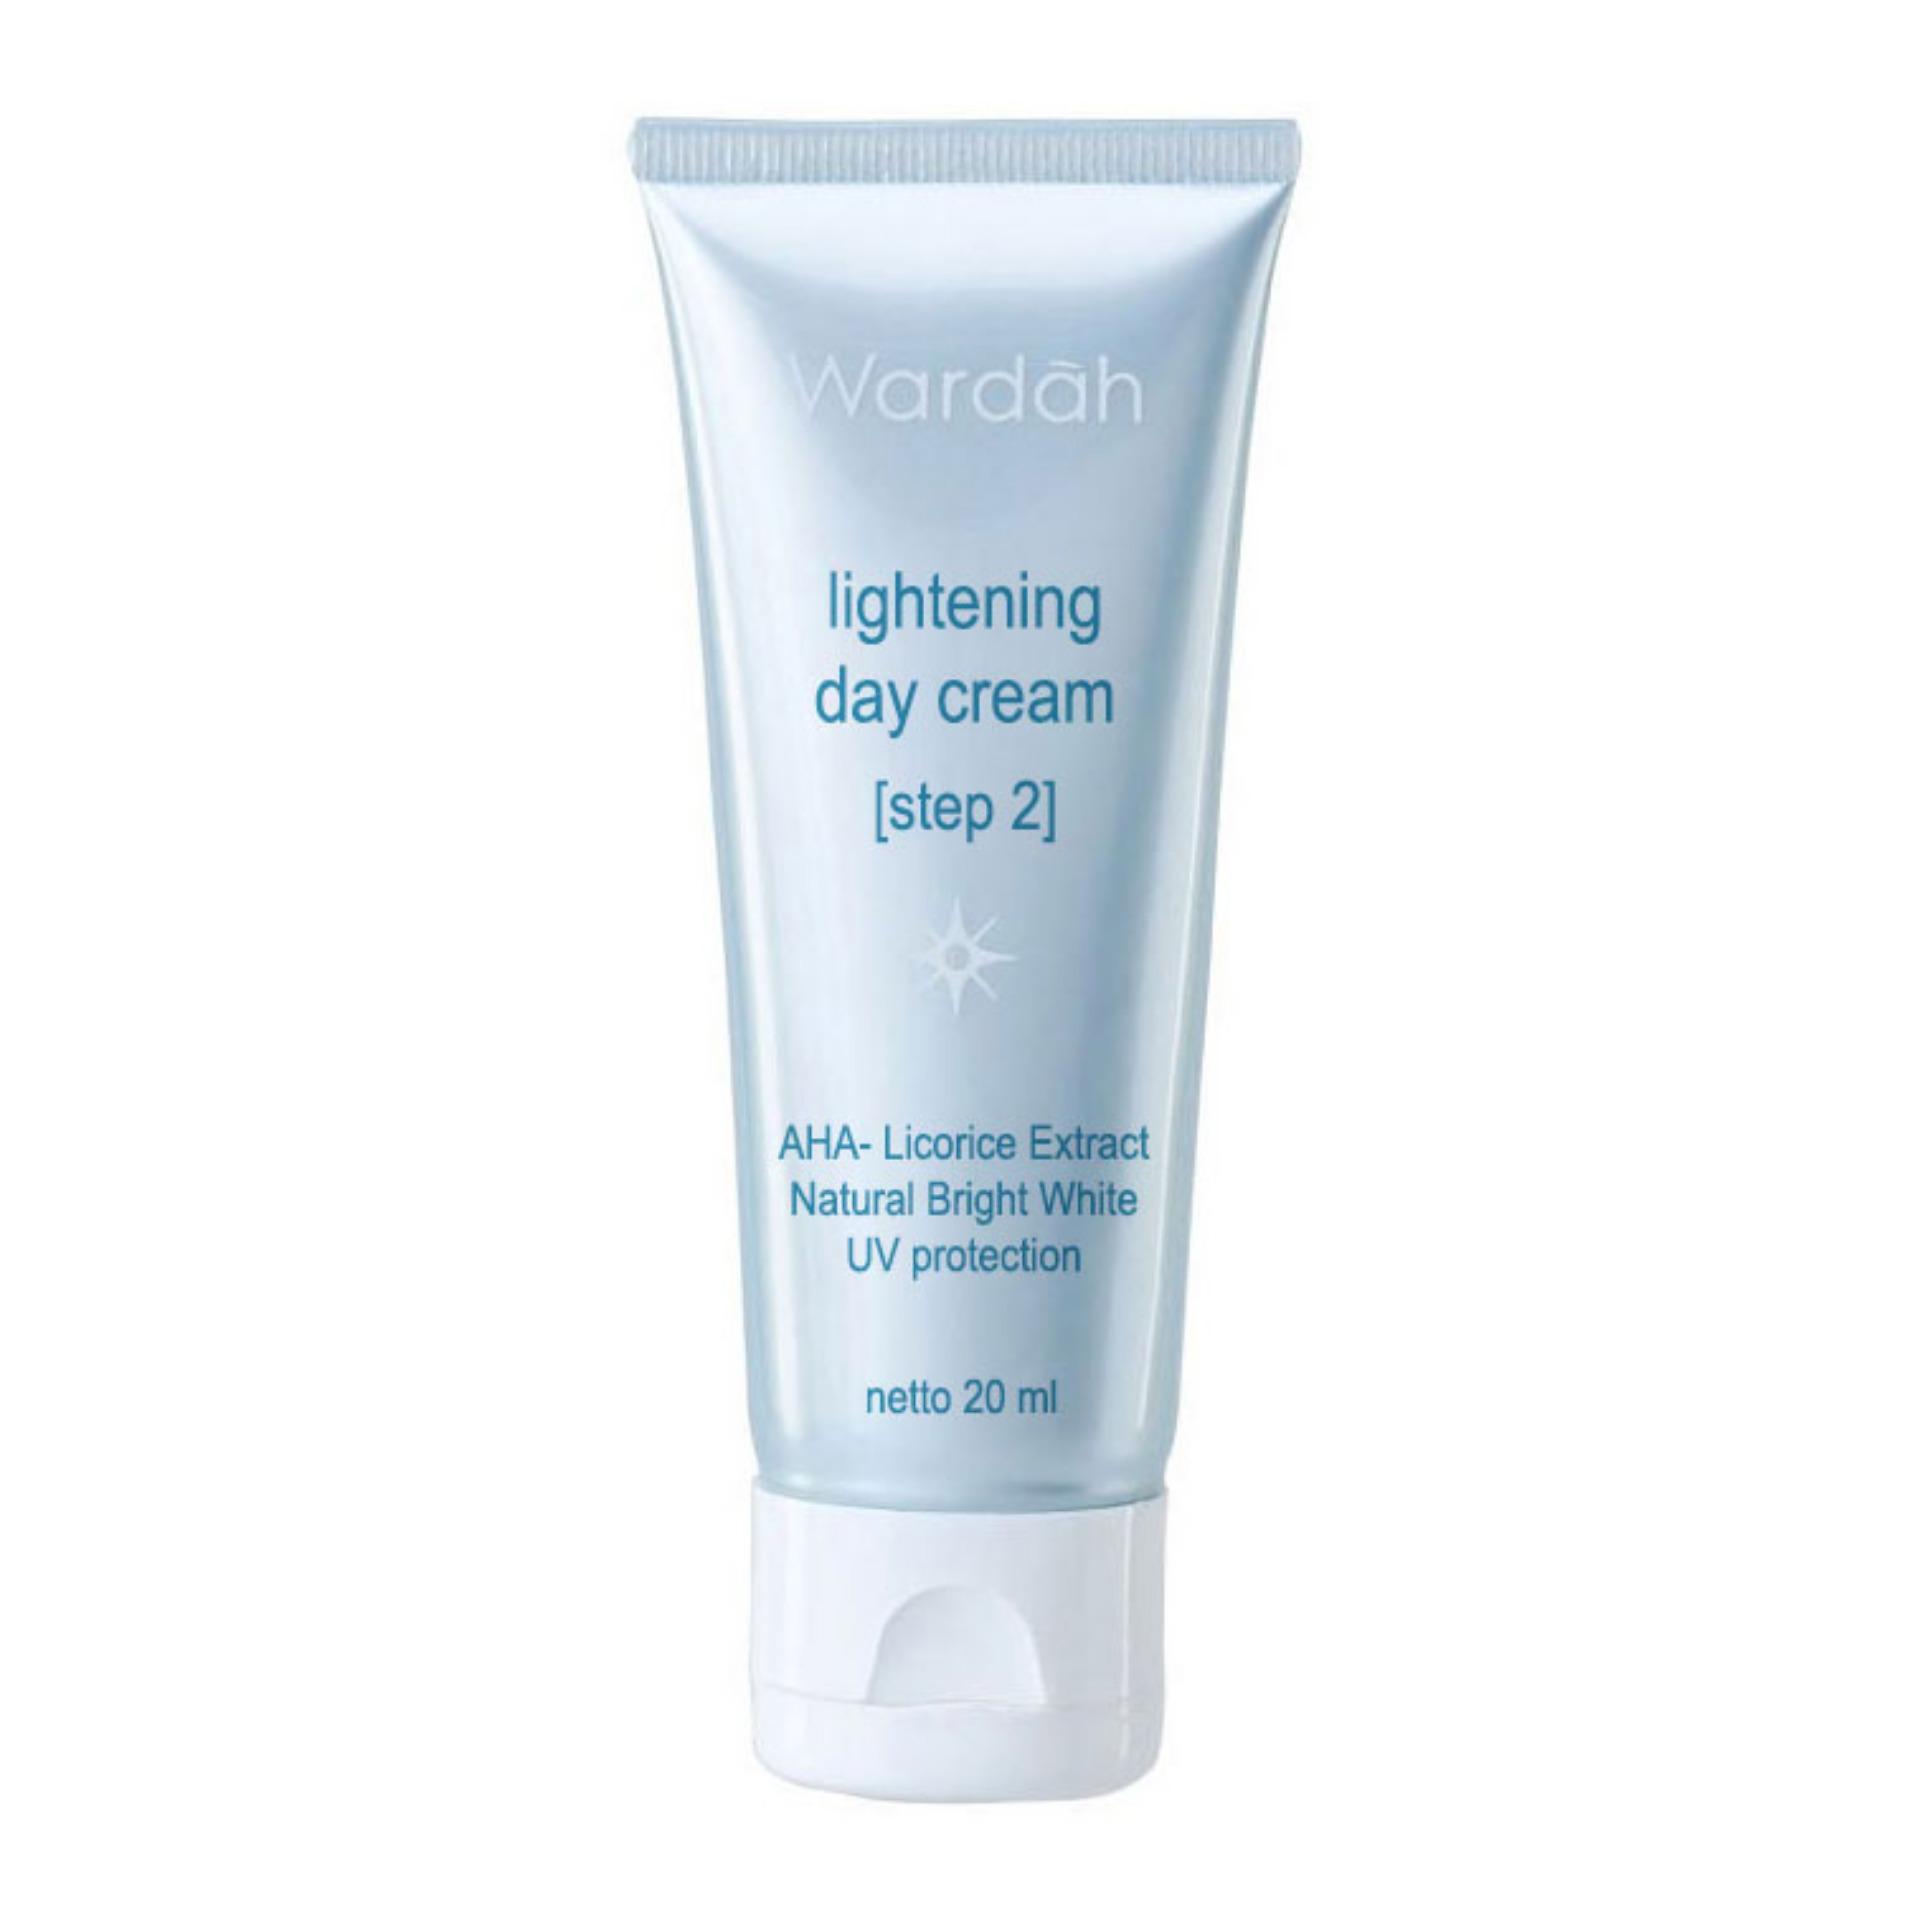 Wardah Lightening Day Cream Step 2 - 20ml (Tube Kecil)